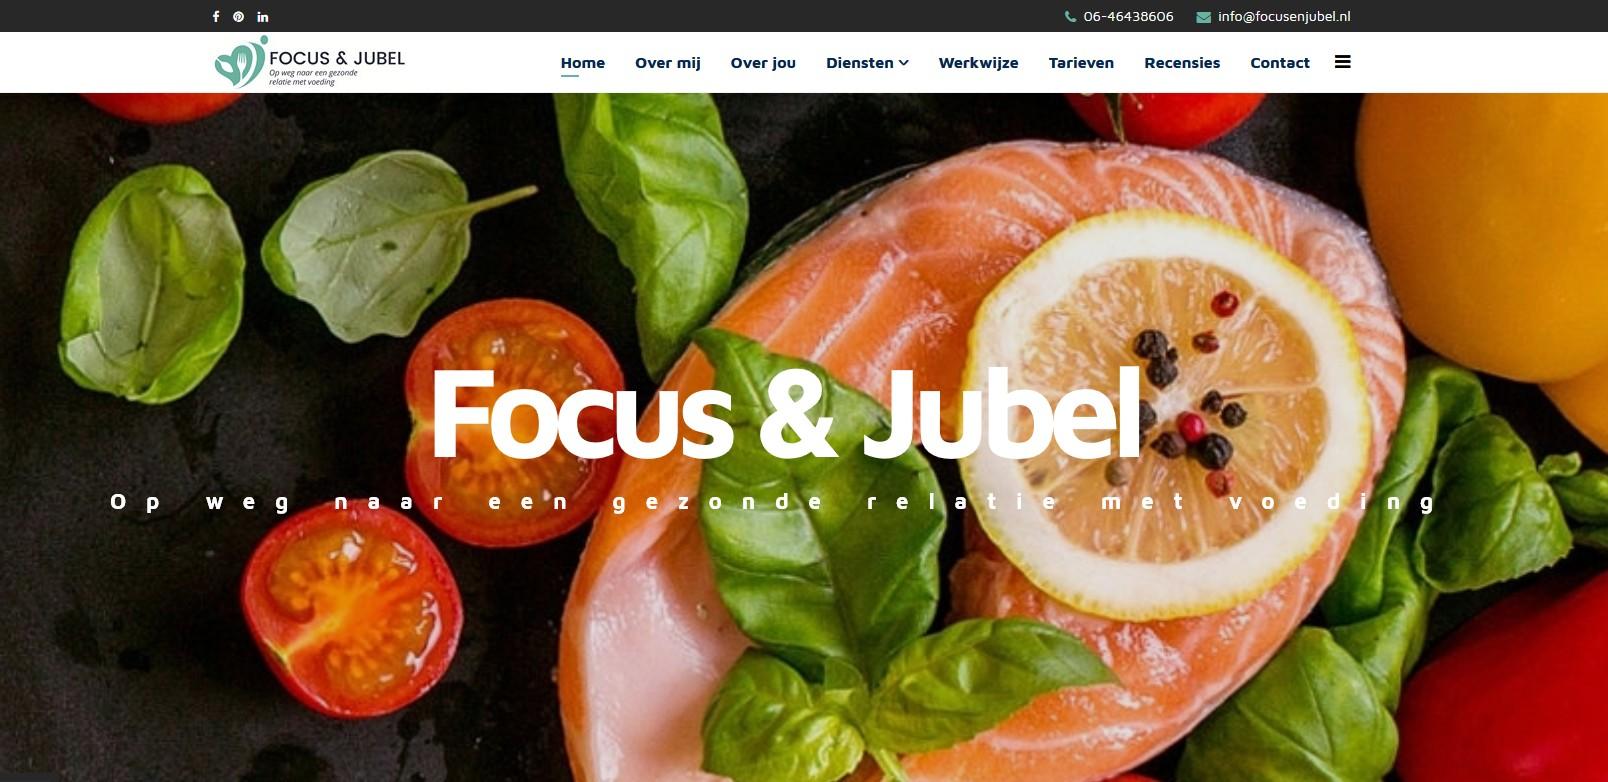 Focus & Jubel